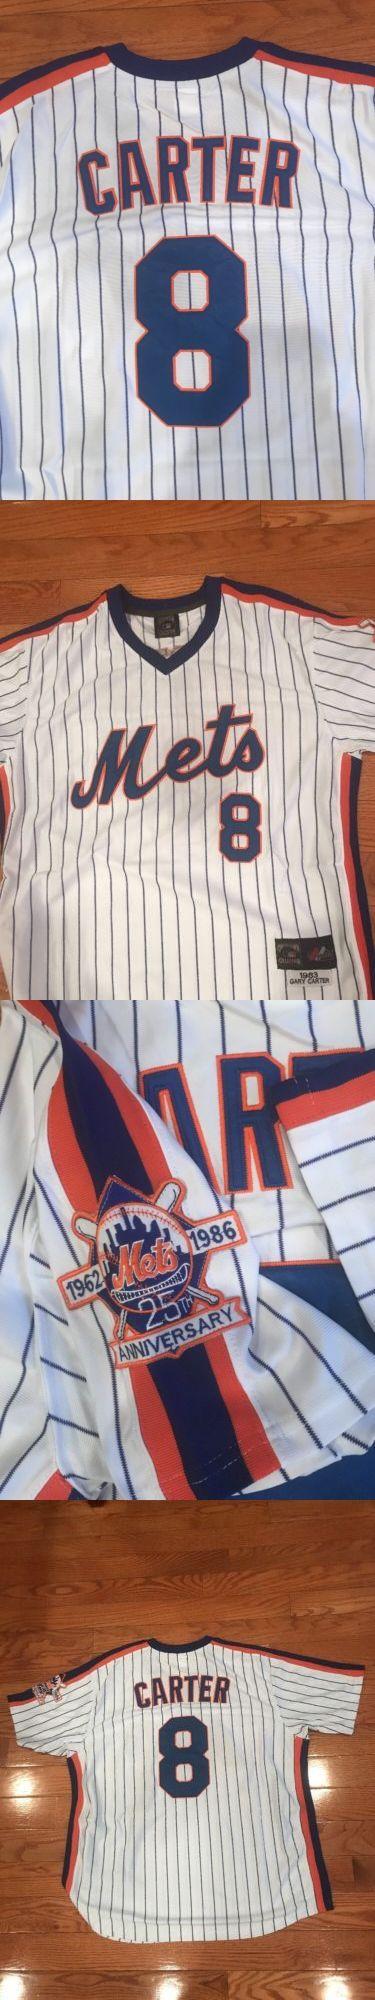 Baseball-MLB 24410: New York Mets Gary Carter Throwback Jersey #8 Men S Xl Baseball Jersey New Sewn -> BUY IT NOW ONLY: $55.95 on eBay!